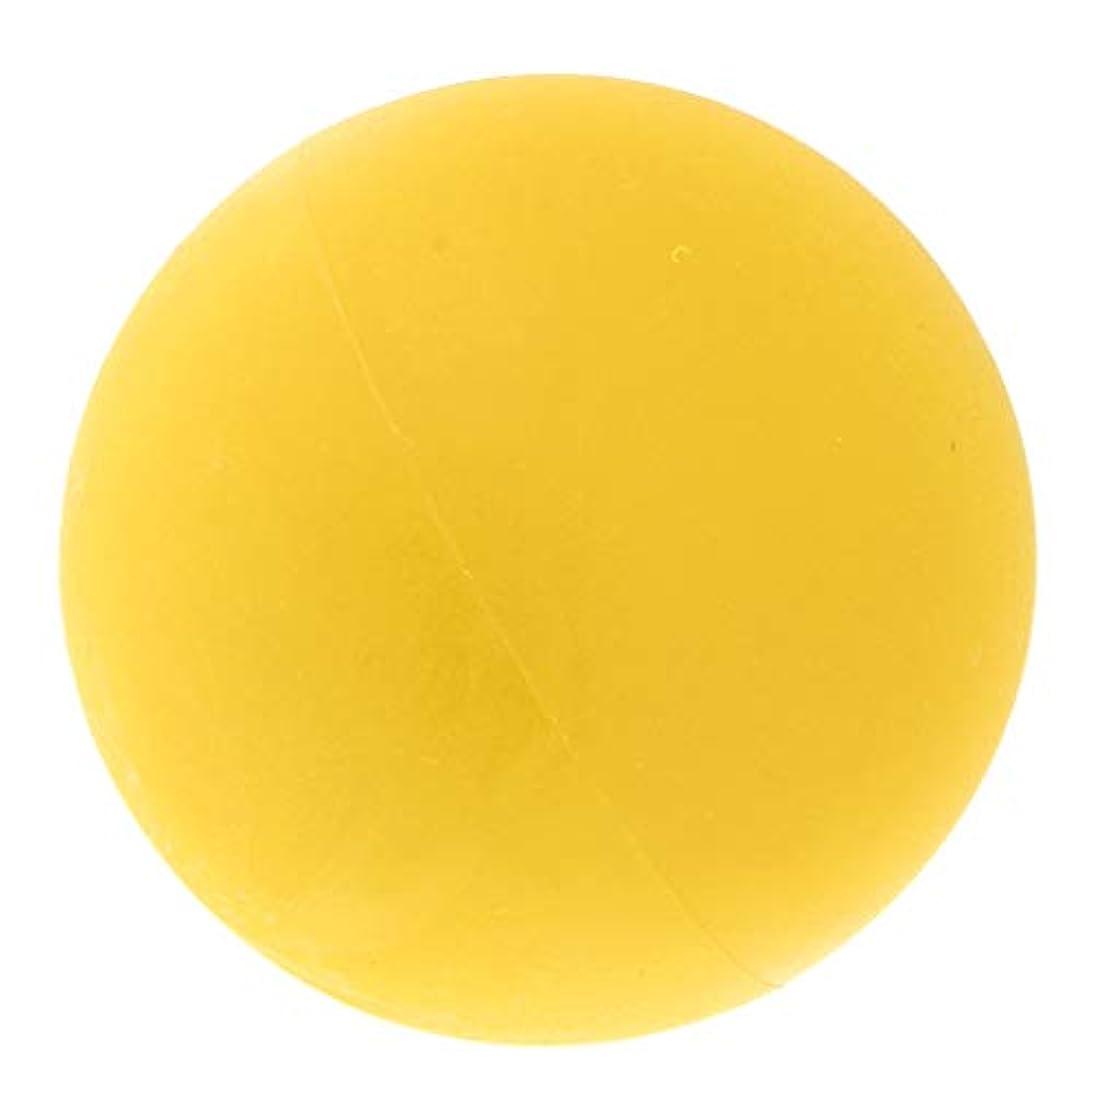 P Prettyia マッサージボール トリガーポイント 筋膜リリース トレーニング ヨガ ツボ押しグッズ 全4色 - 黄